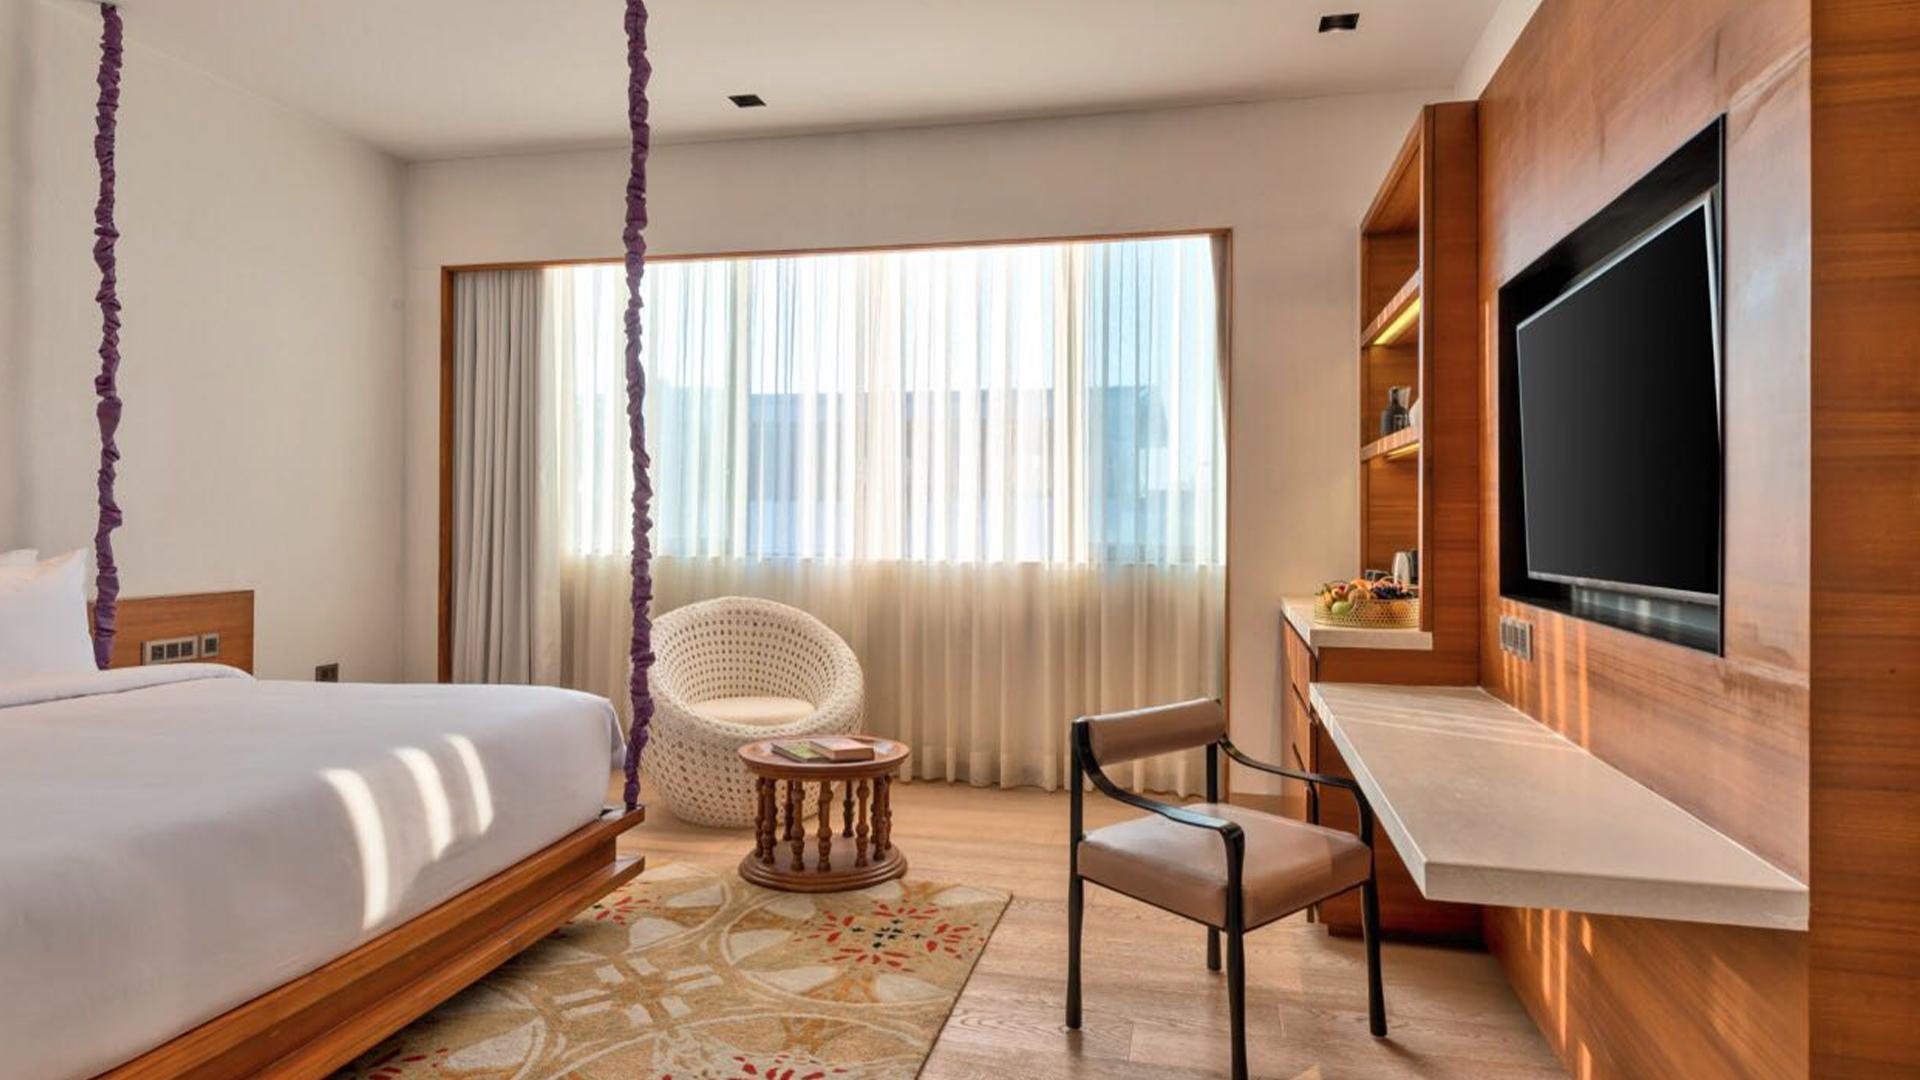 Luxury Room image 1 at Azaya Beach Resort by South Goa, Goa, India